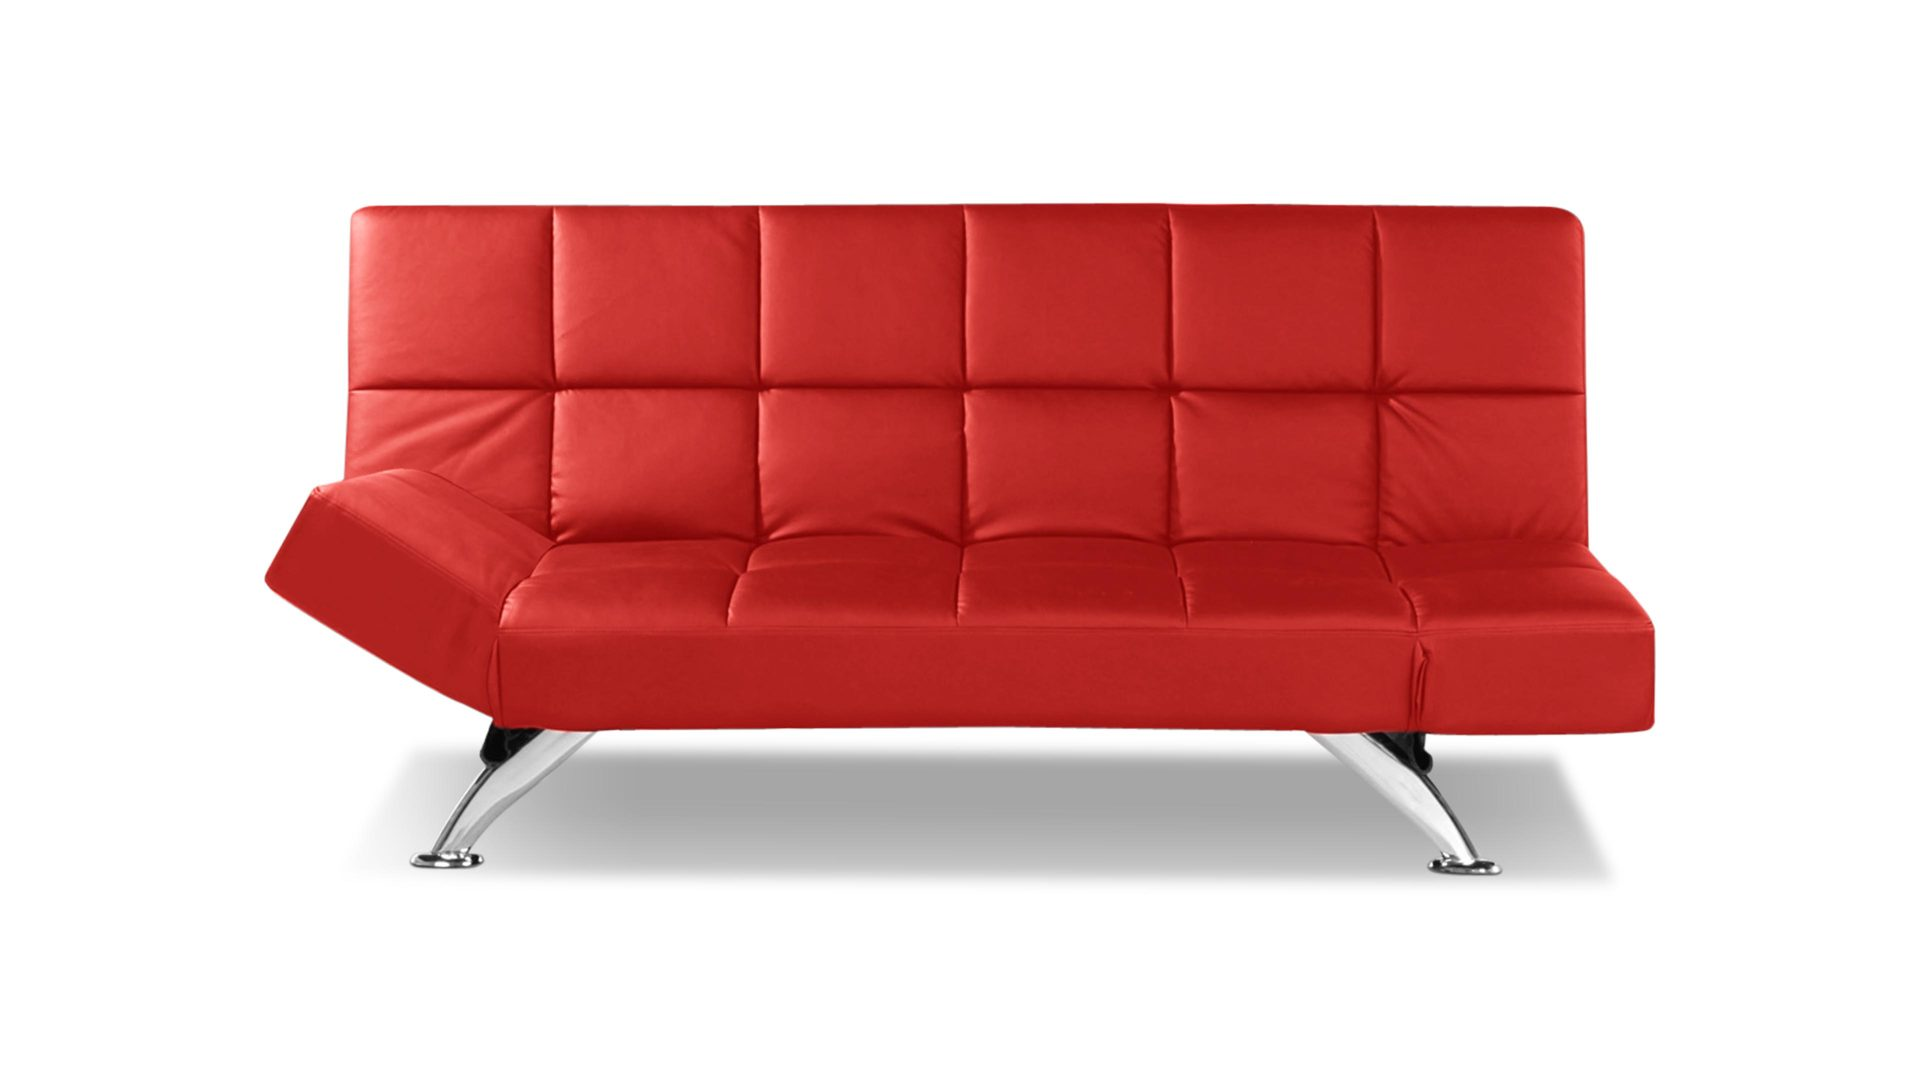 sofa jugendzimmer | jtleigh - hausgestaltung ideen